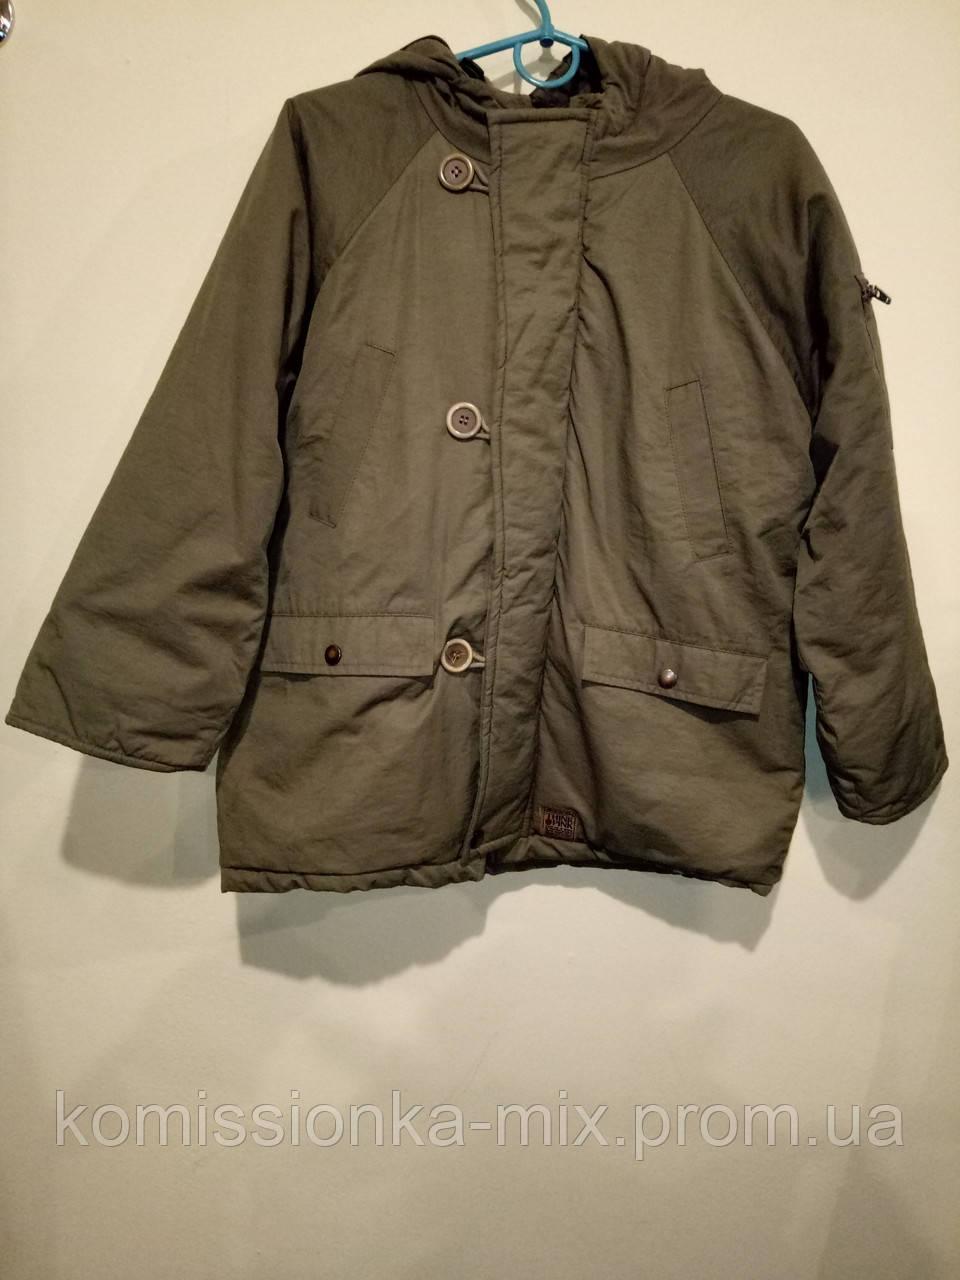 Куртка демисезонная KP  140 рост.